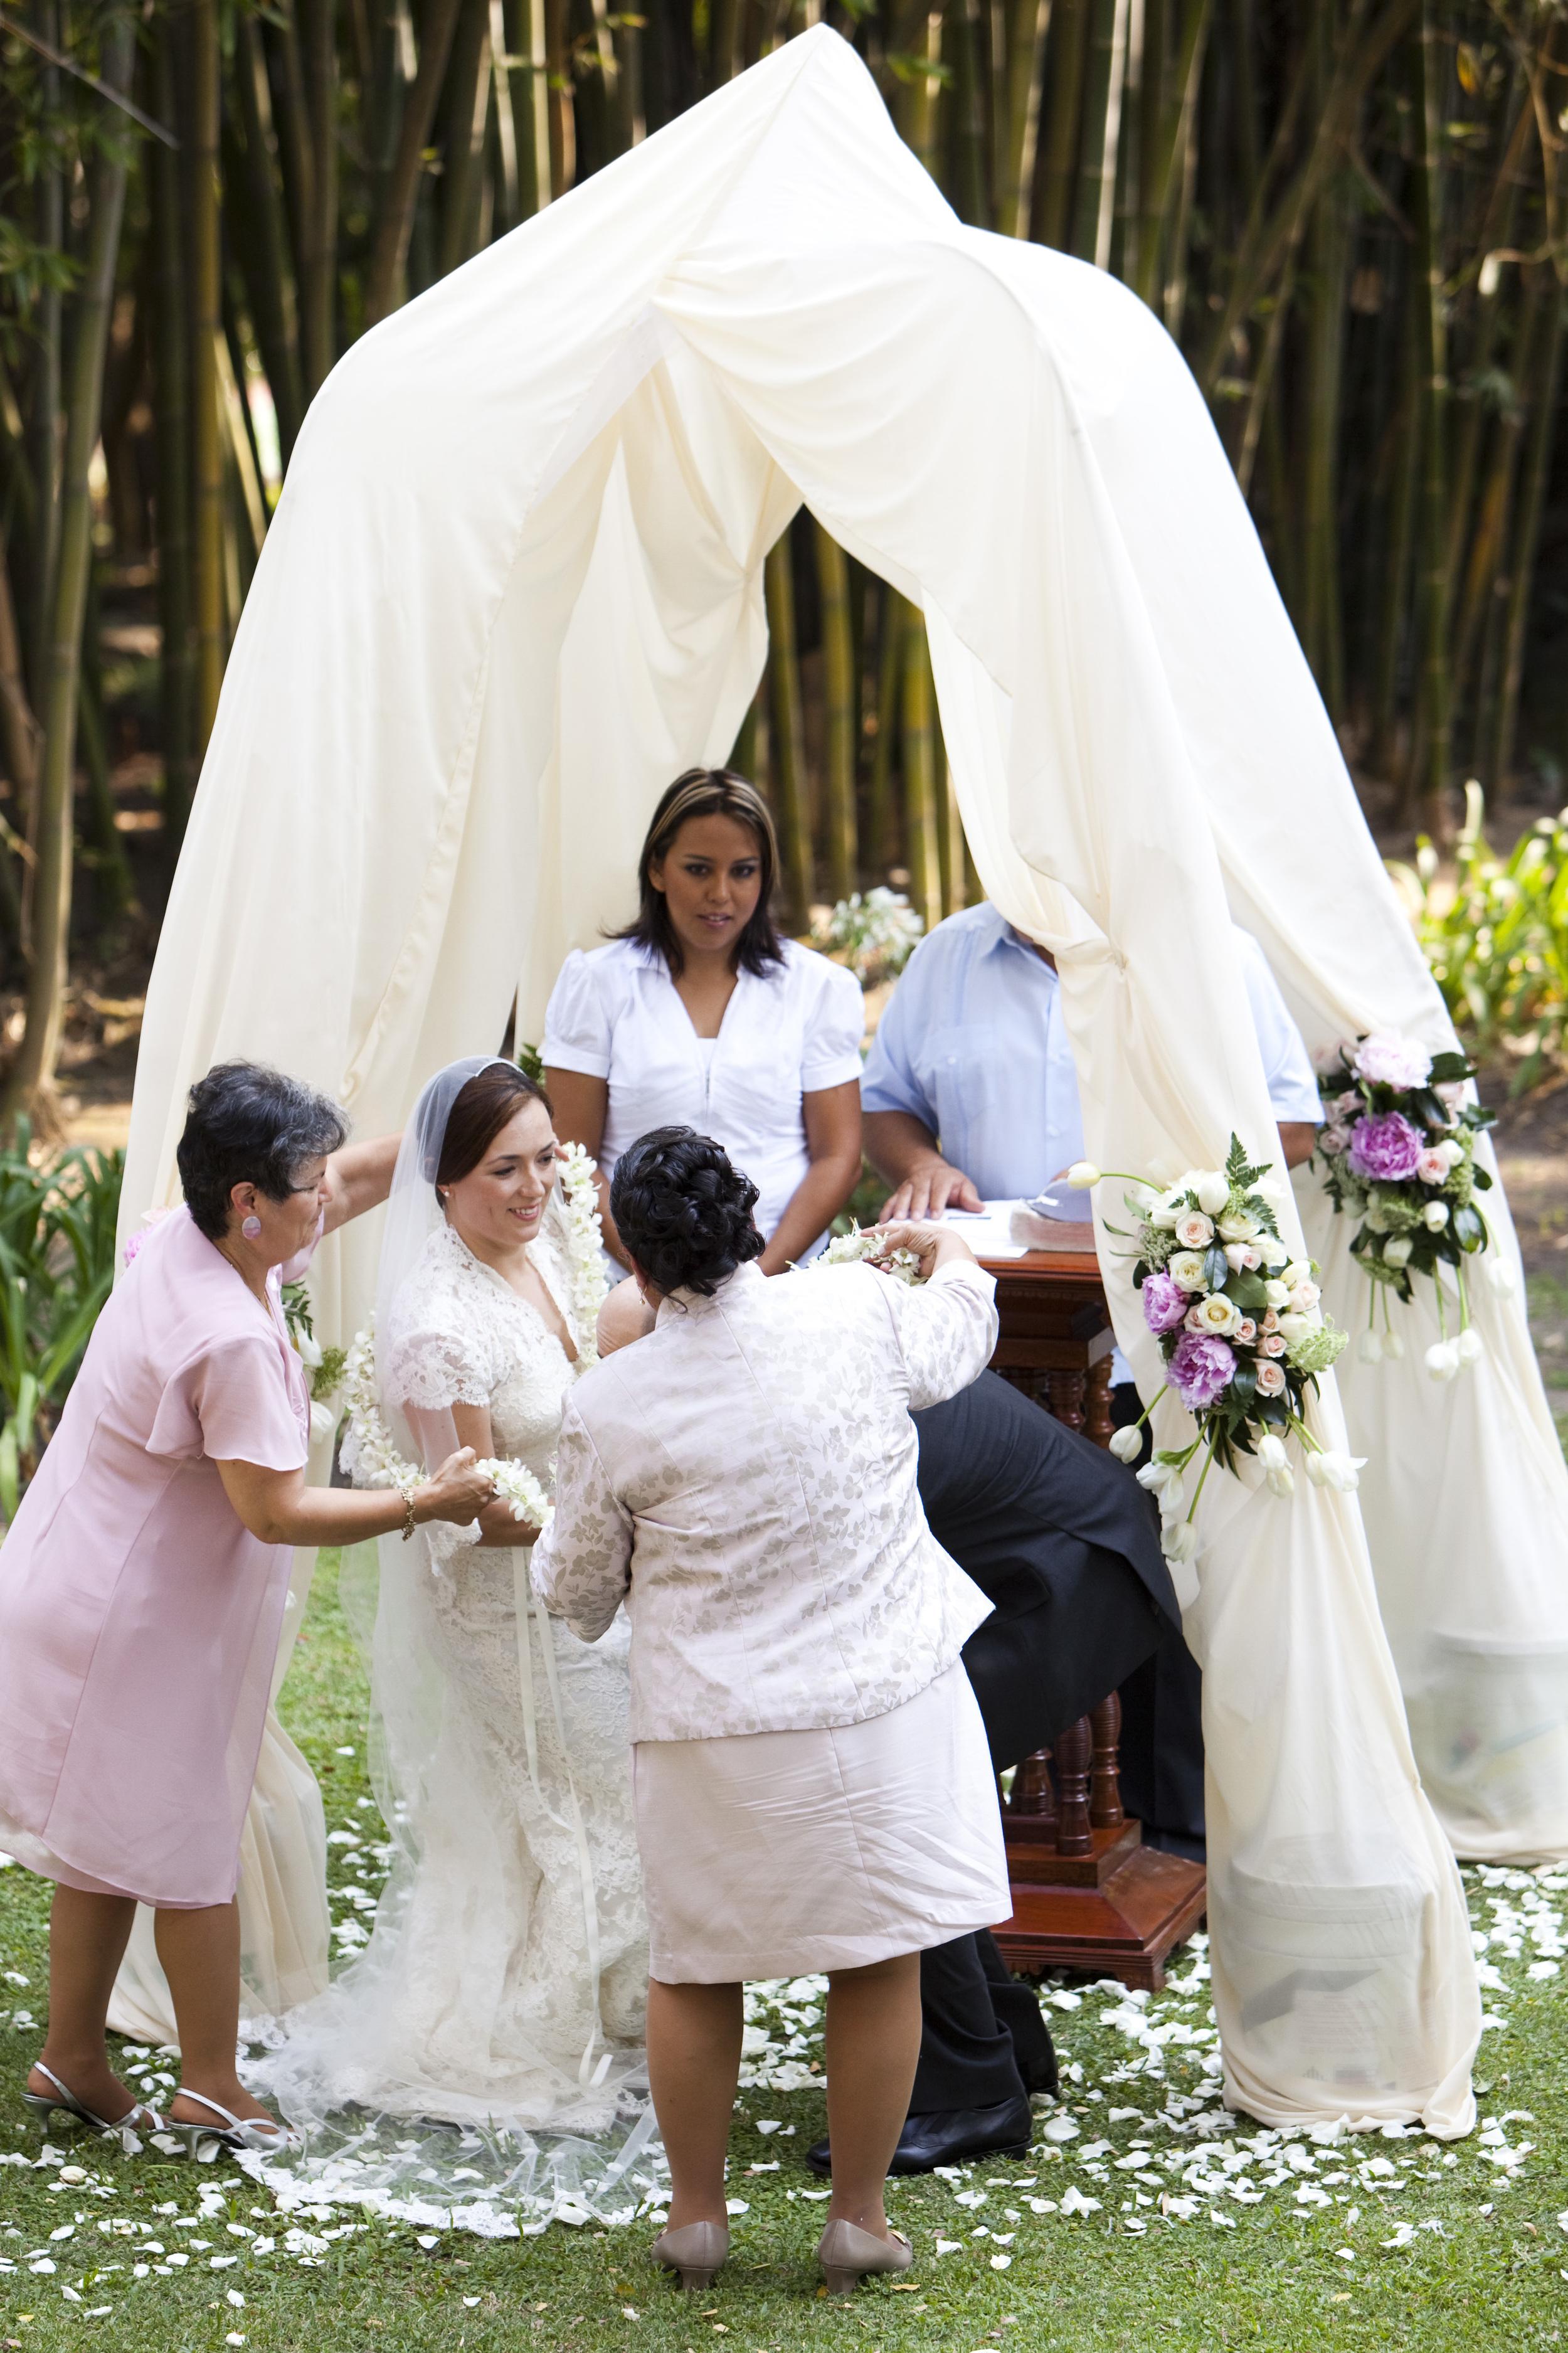 Ceci_New_York_Style_Luxury_Custom_Mexico_Wedding_CeciBride_Letterpress_NewYork_Foil_Hacienda_de_San_Antonio_21.jpg